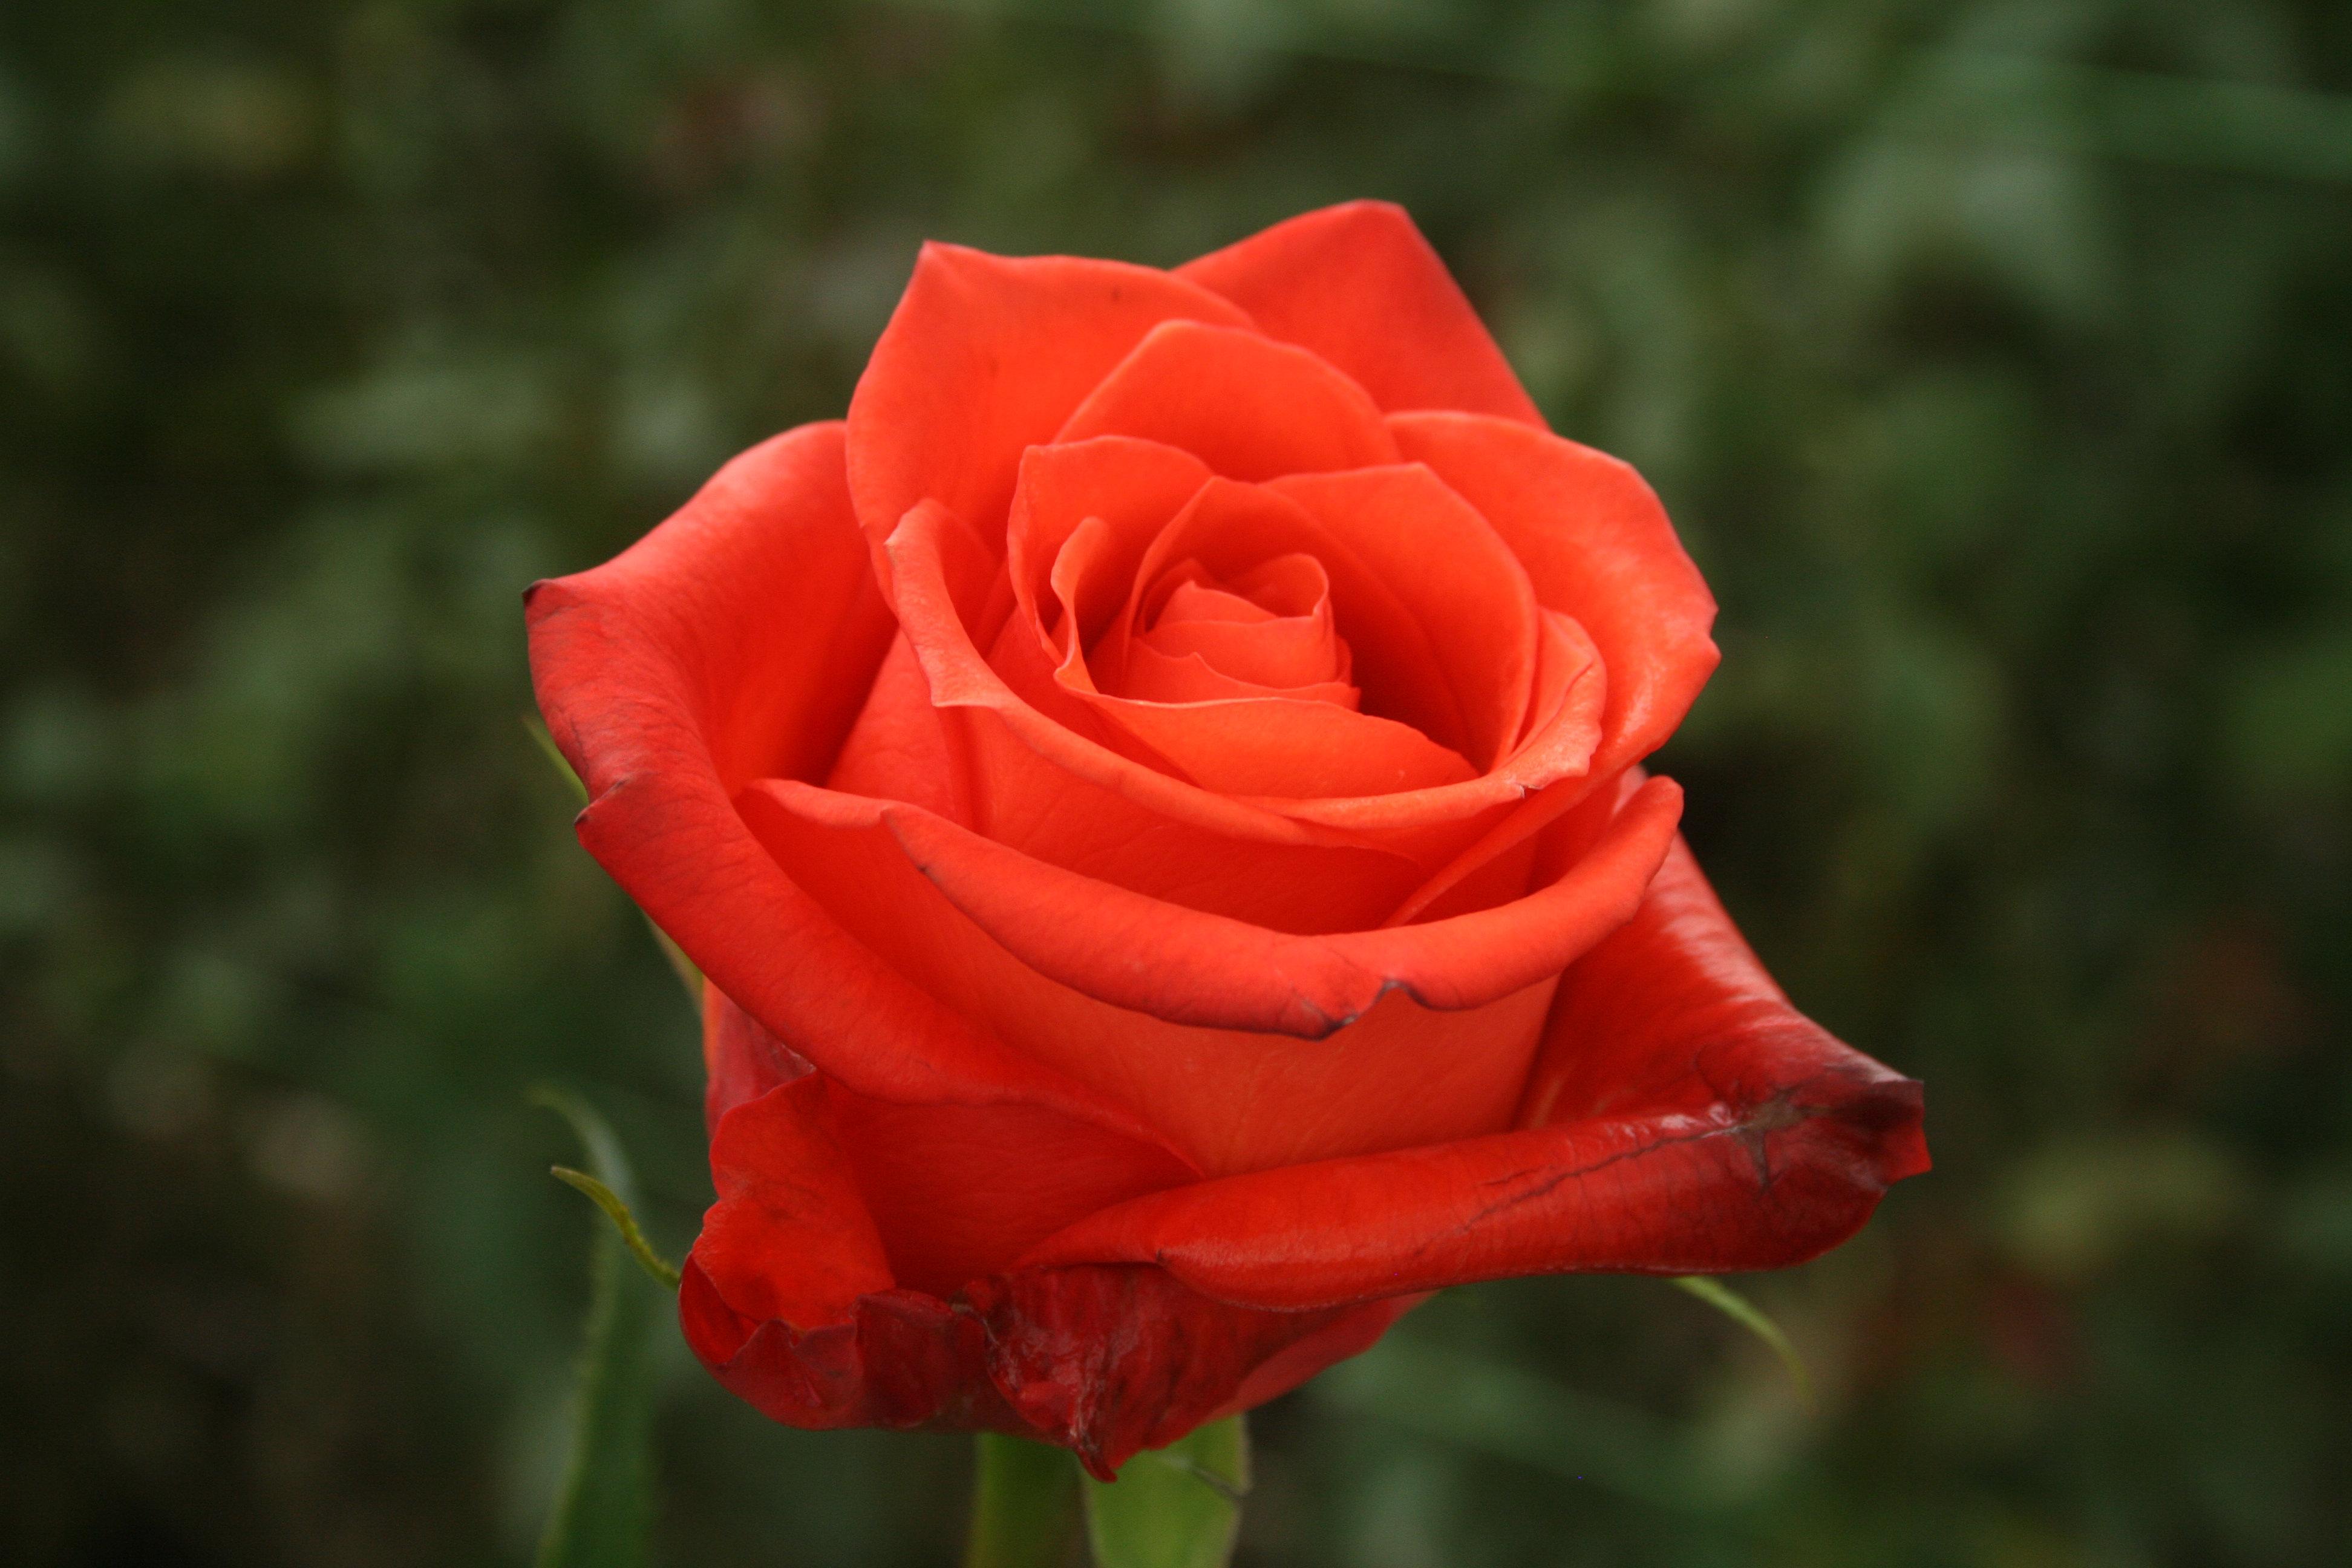 wholesale colombian roses rose growers wholesaler. Black Bedroom Furniture Sets. Home Design Ideas